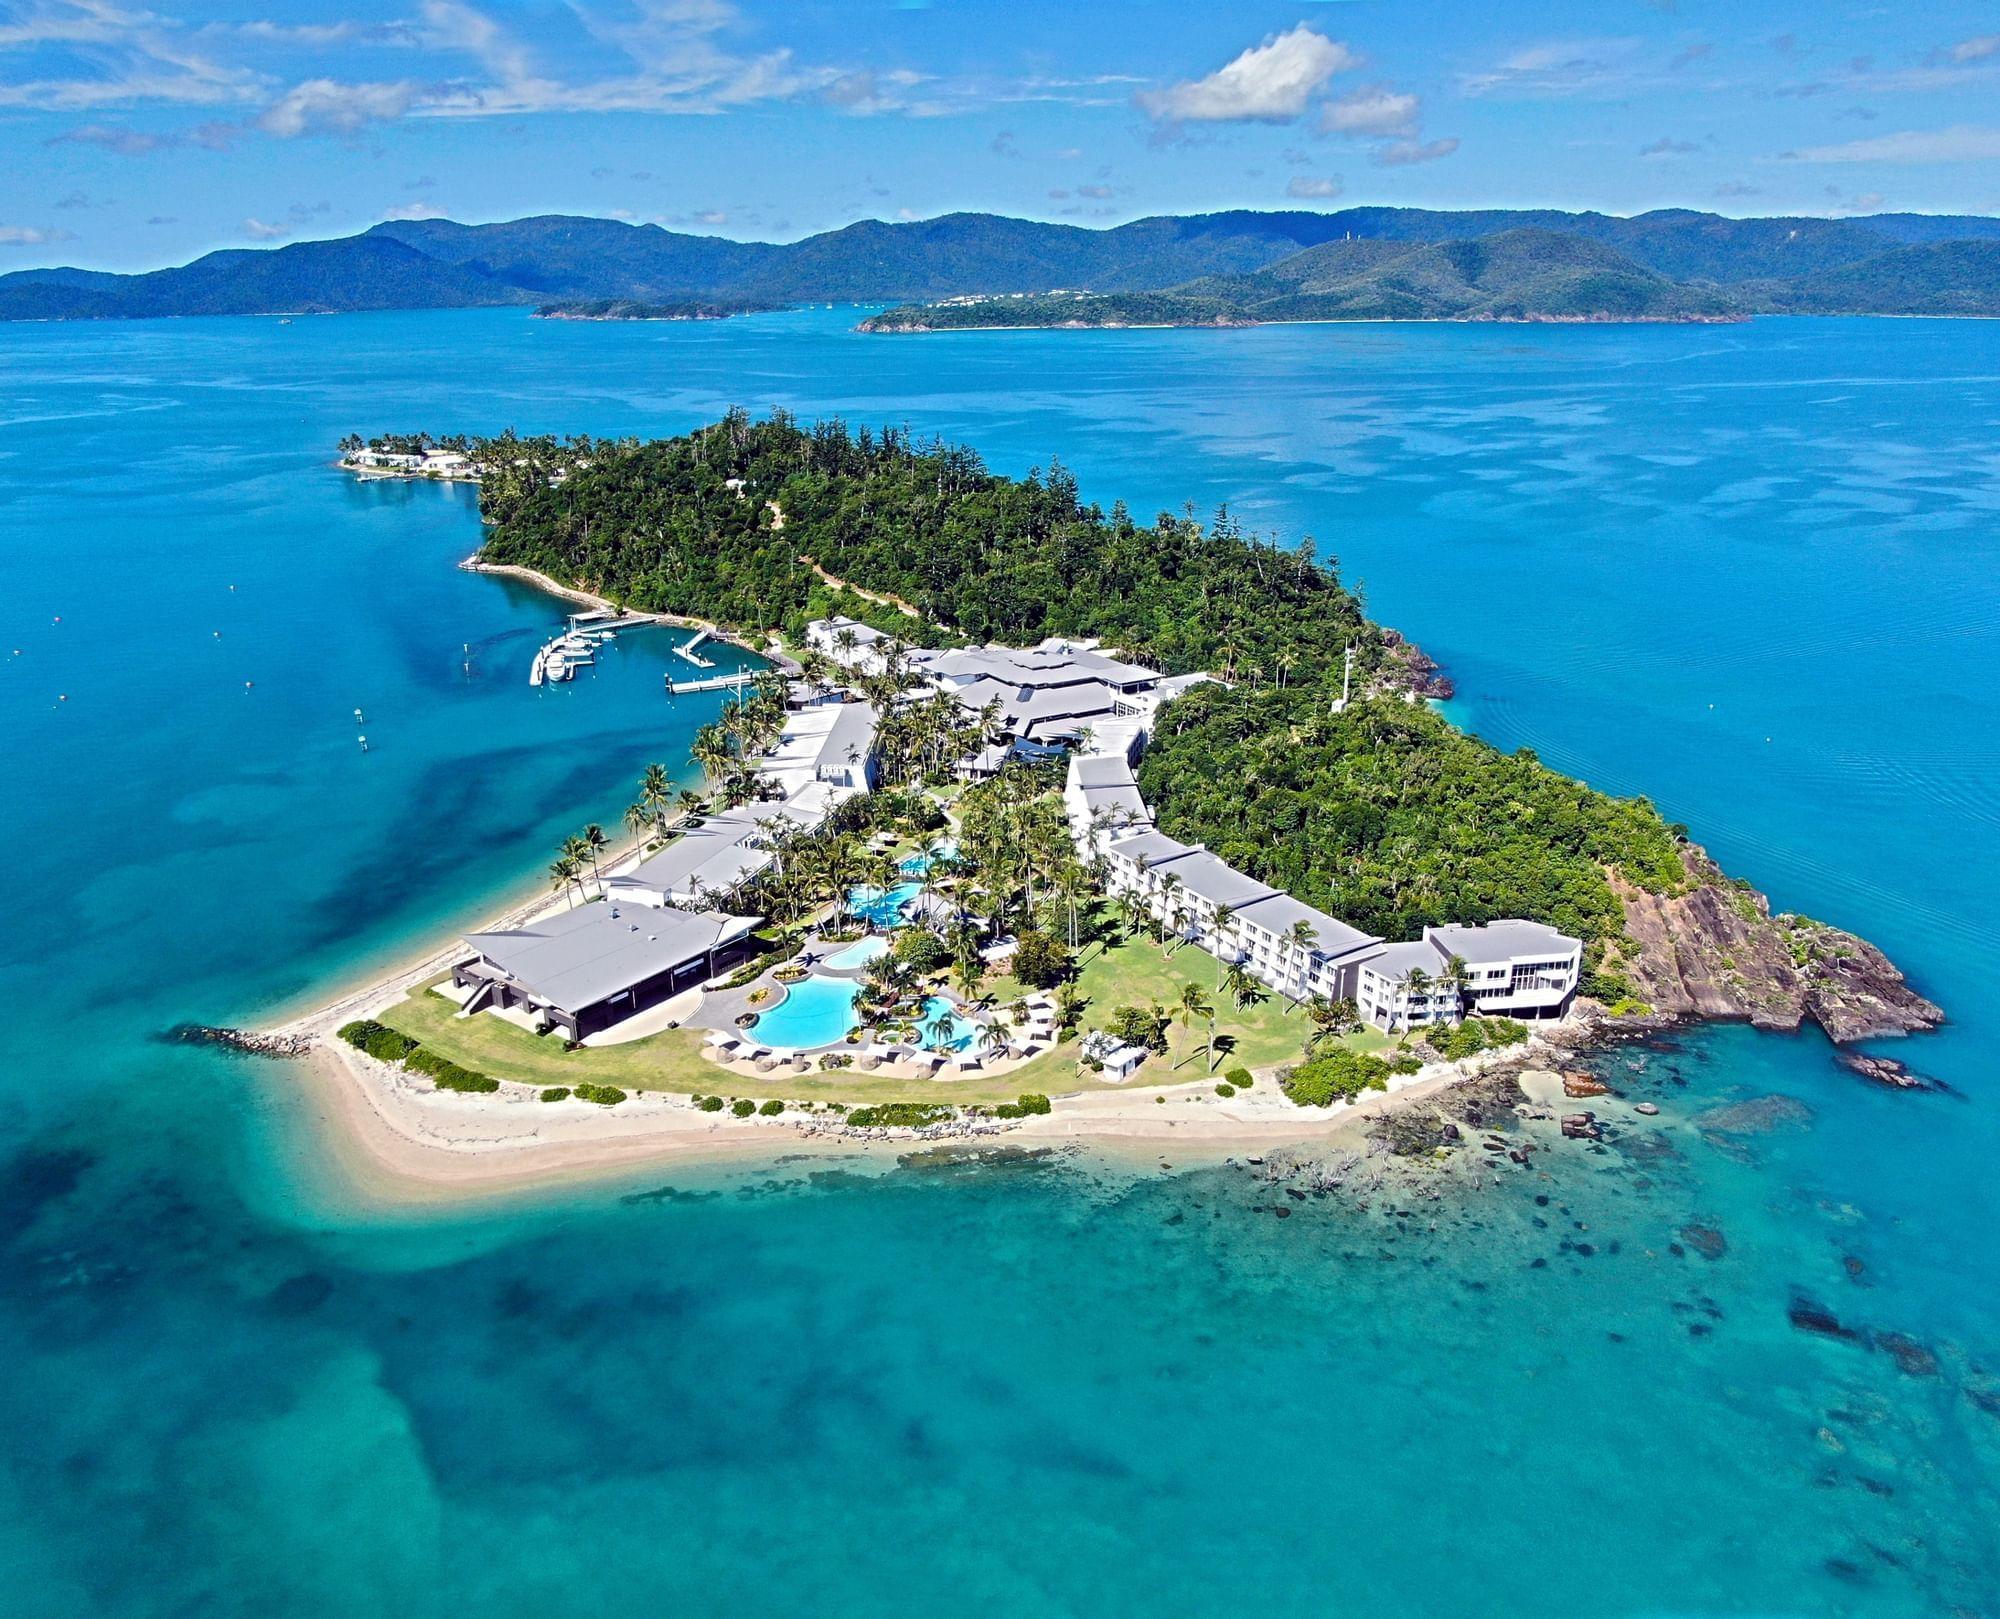 Aerial view of hotel island of Daydream Island Resort